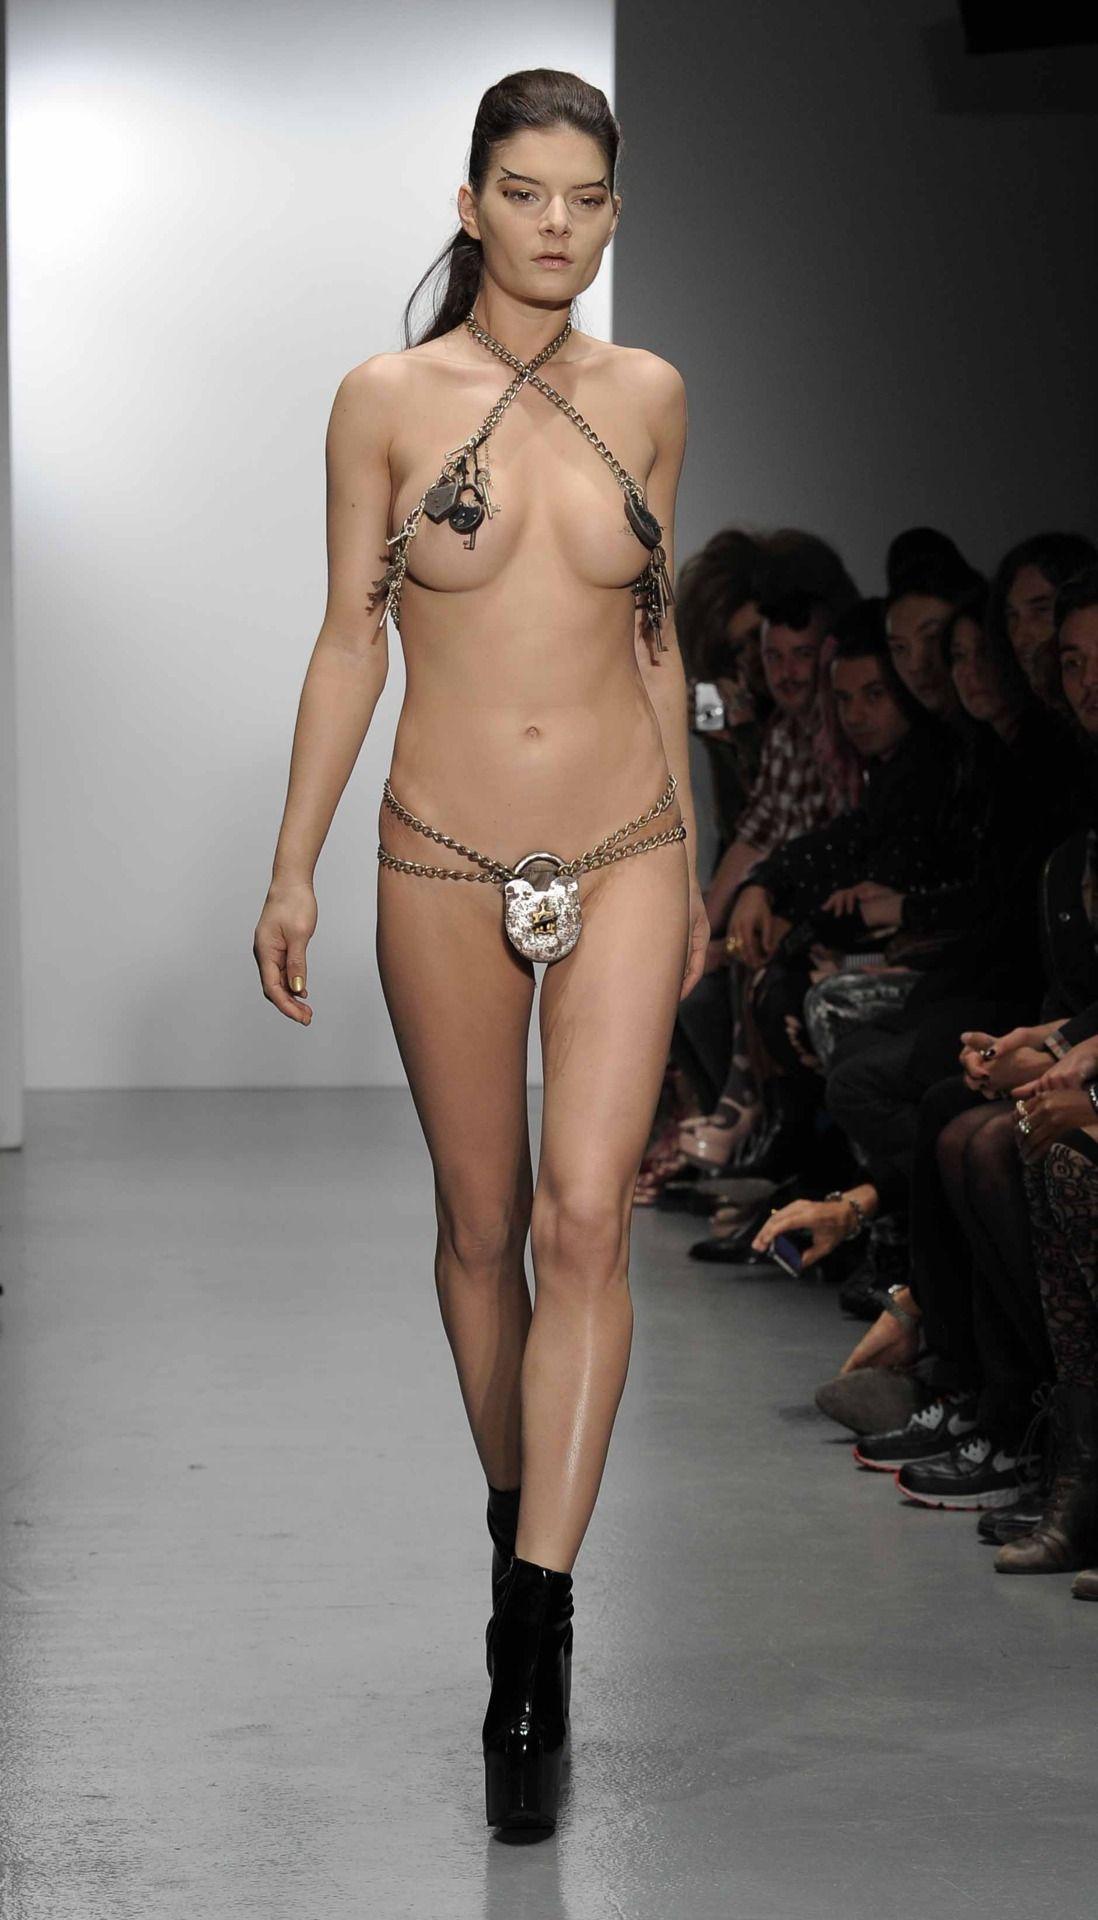 Naked girls chastity torture xxx photo